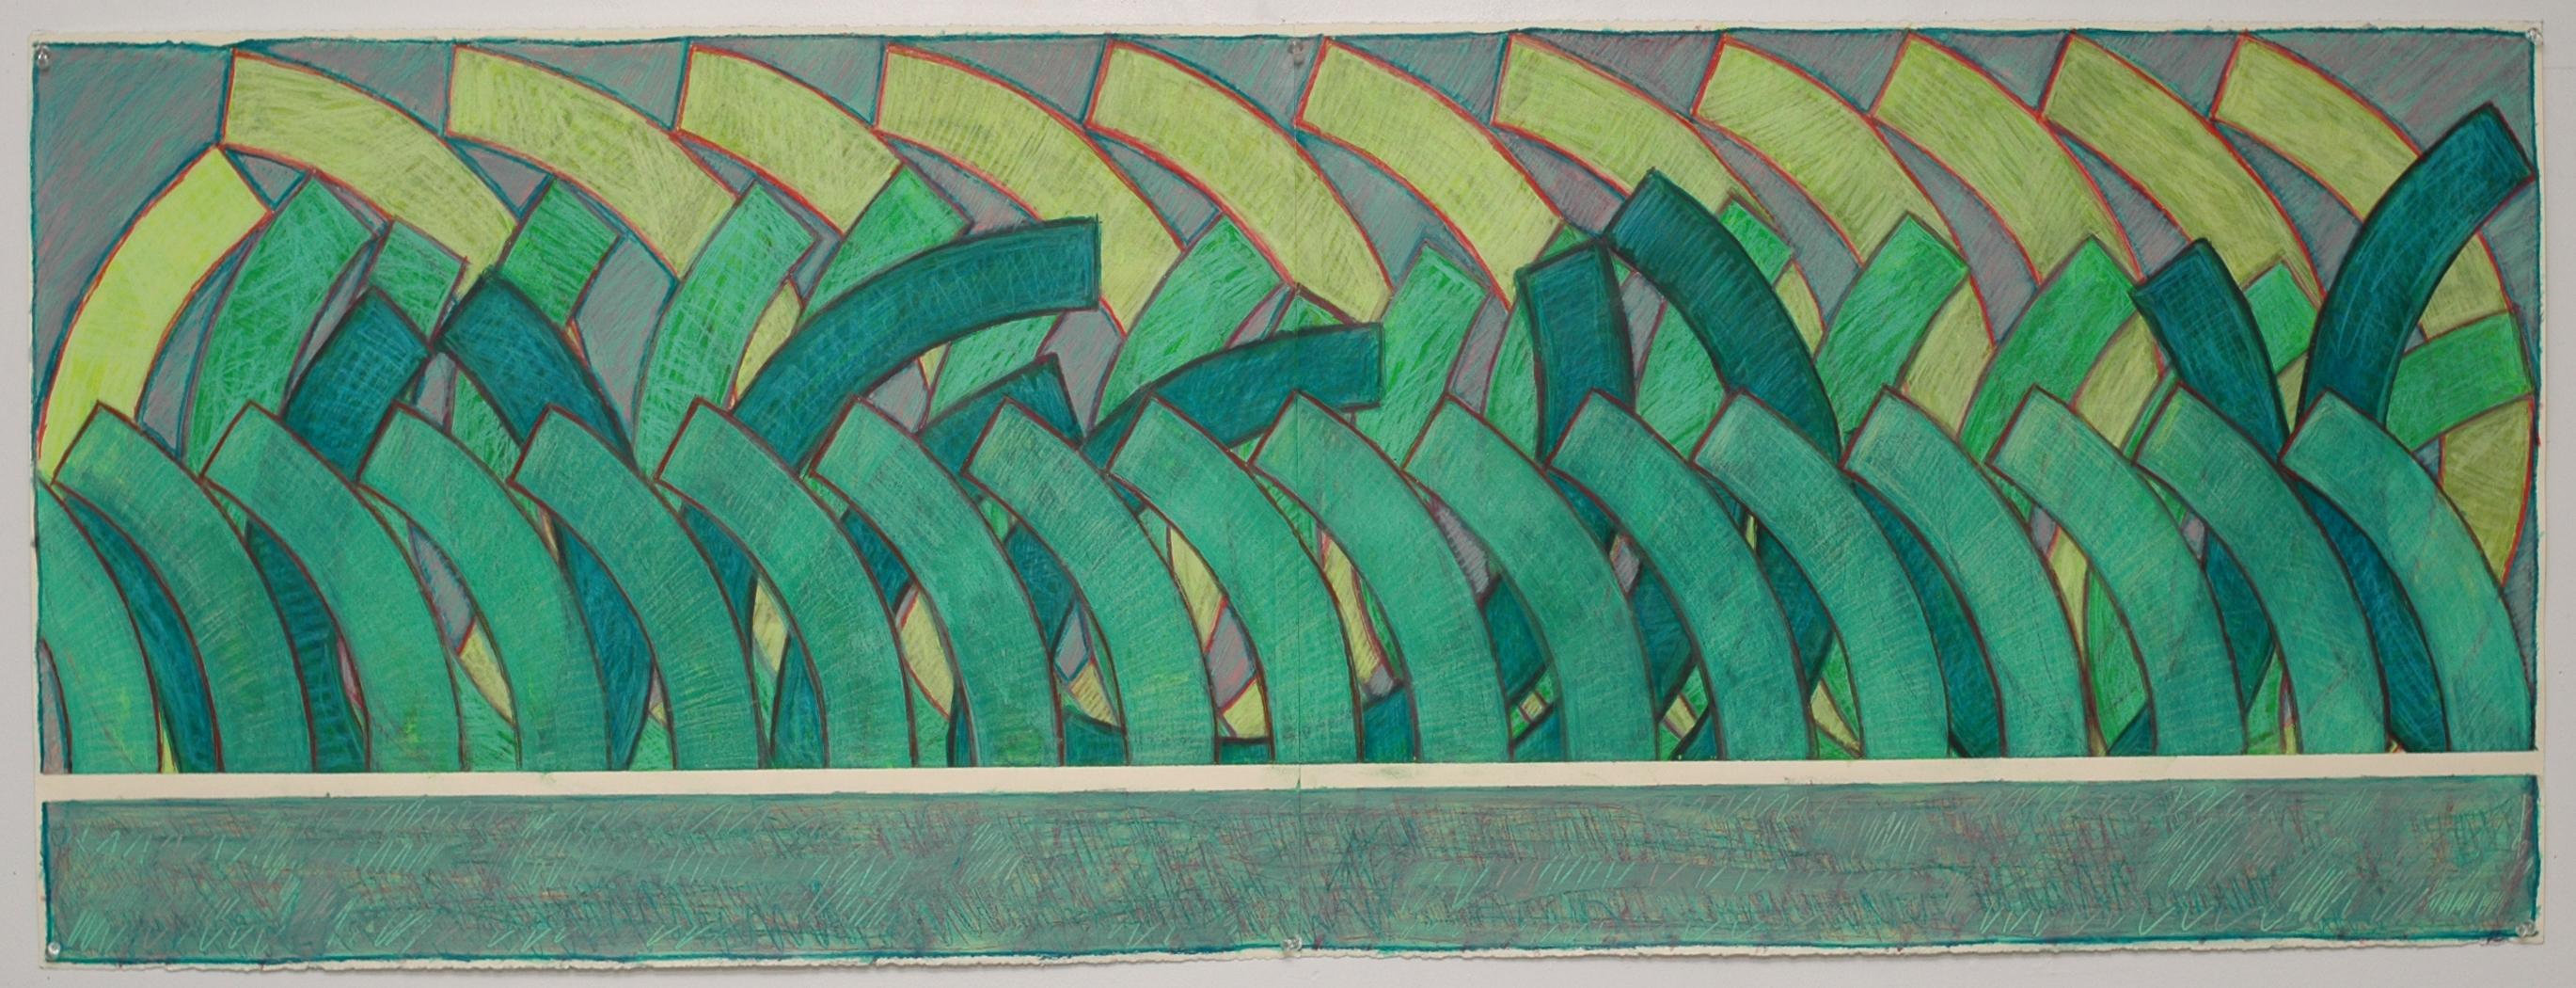 Breaking thru the Wall (green)